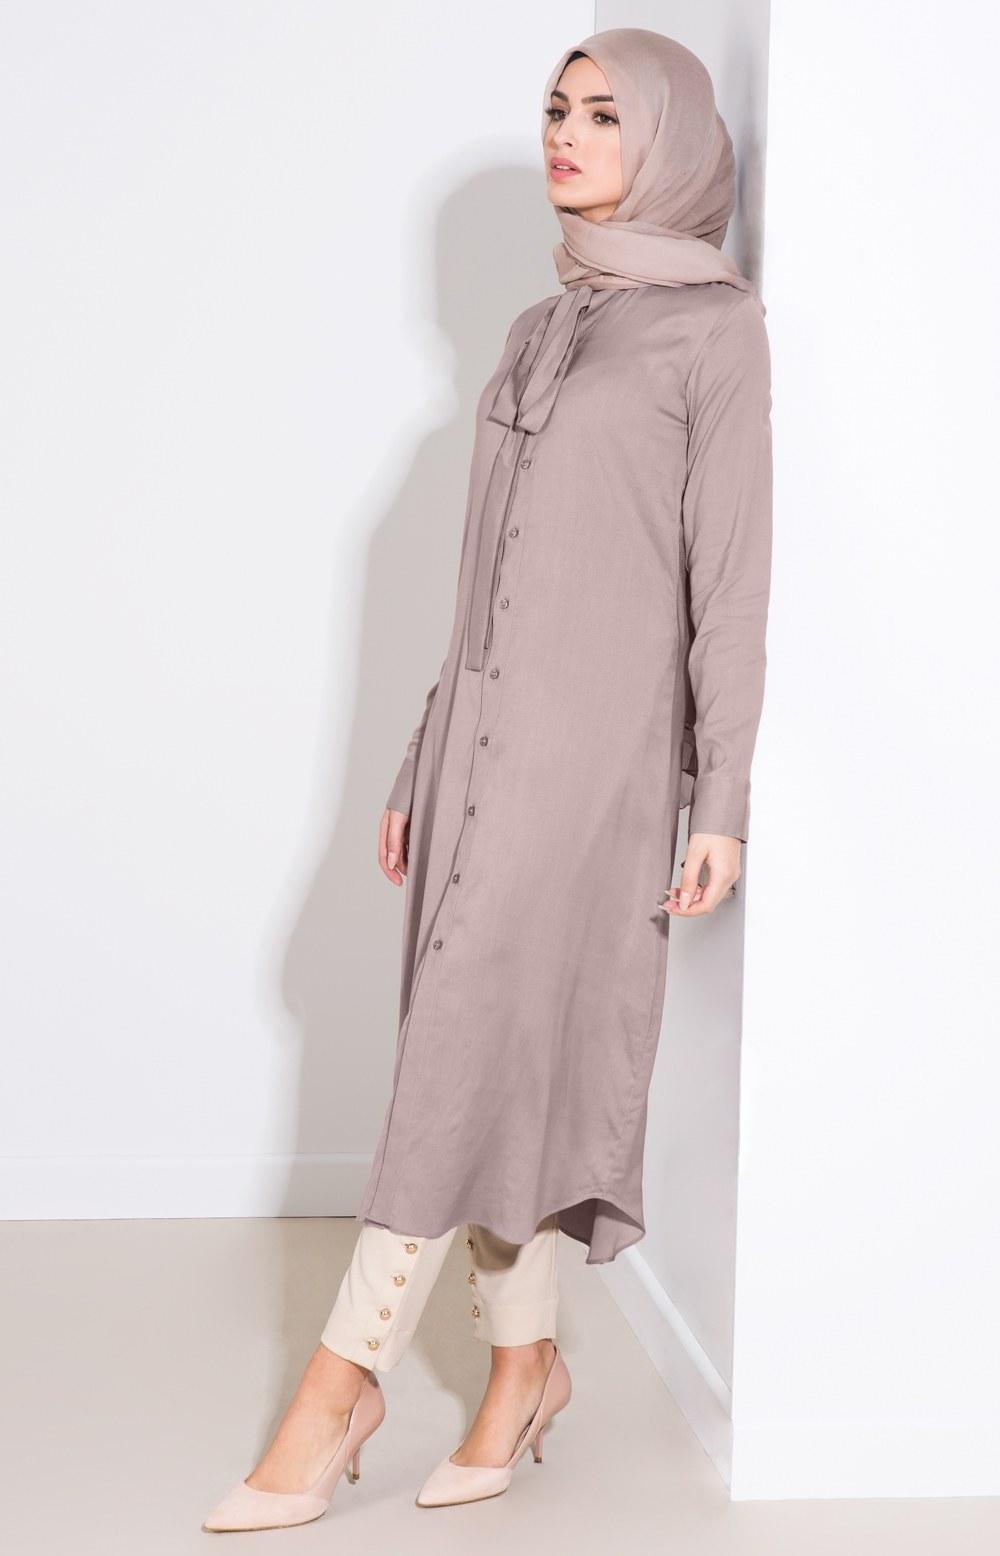 Design Model Baju Lebaran Simple Ftd8 25 Trend Model Baju Muslim Lebaran 2018 Simple & Modis